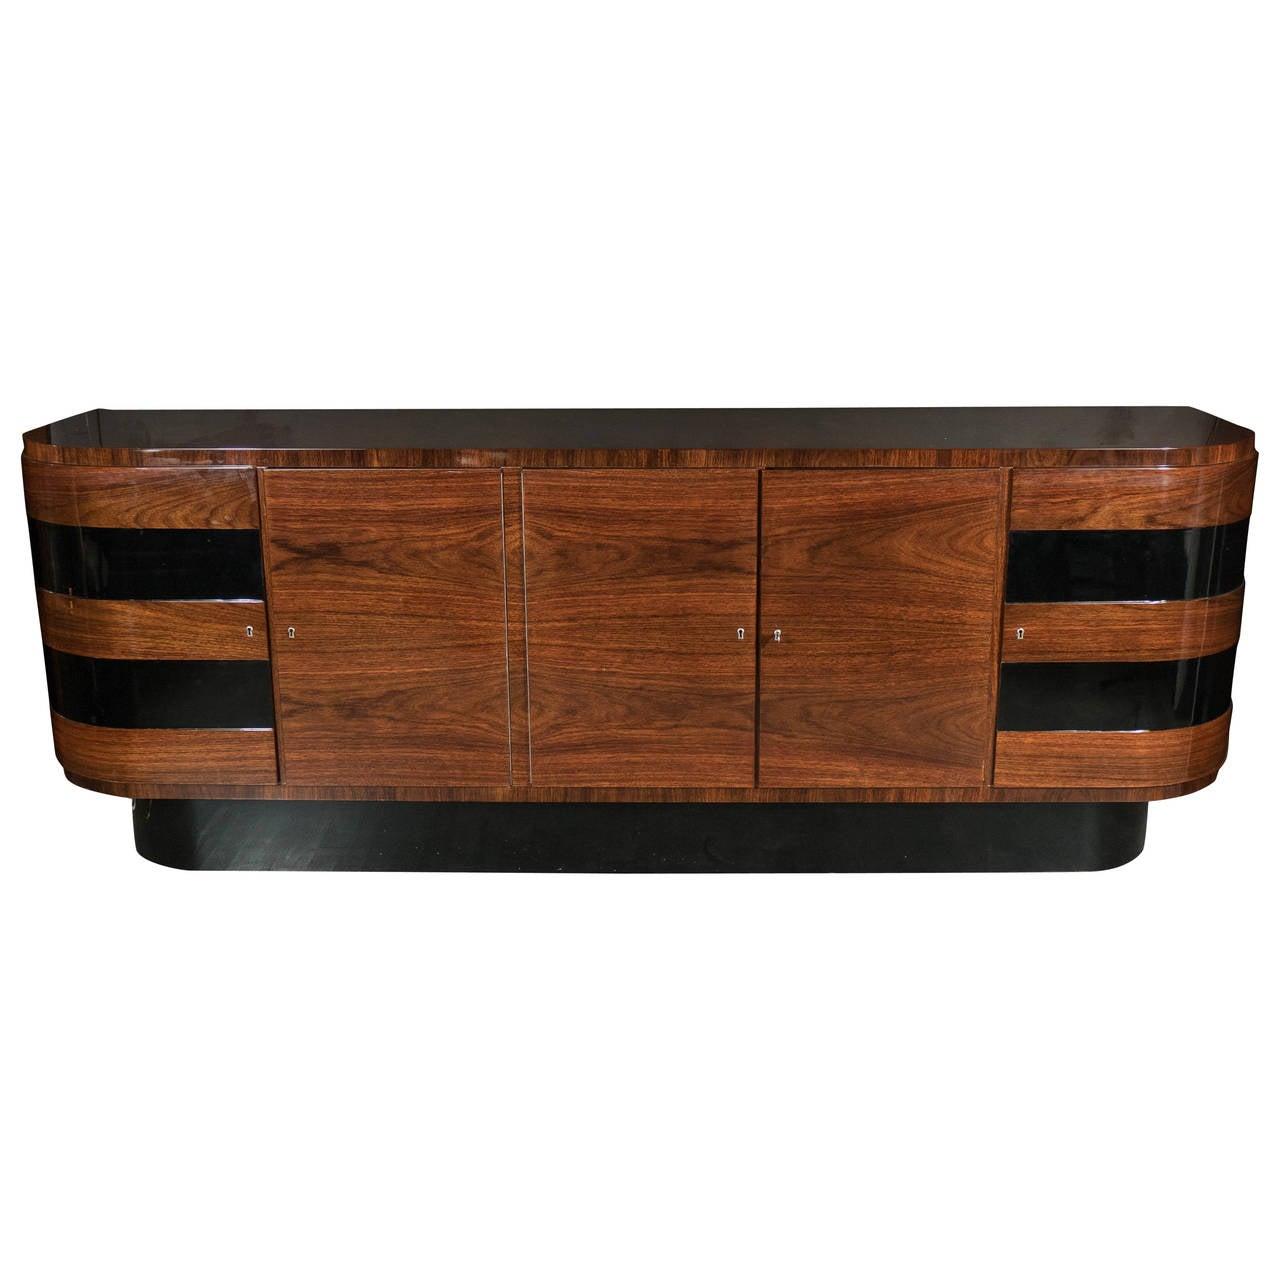 Art Deco Sideboard By Deutsche Mobel In Bookmatched Rosewood